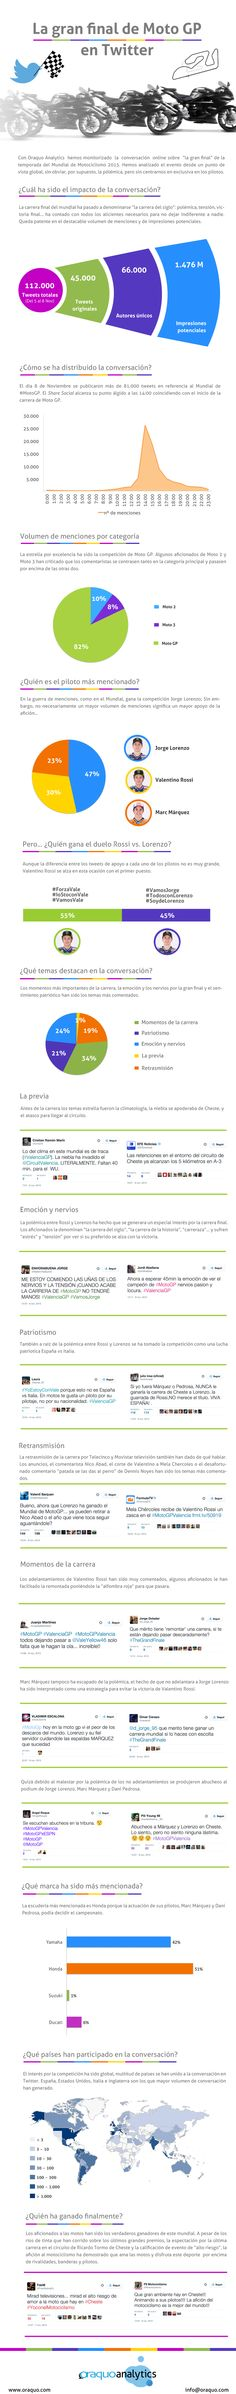 Análisis de la final de moto gp en twitter